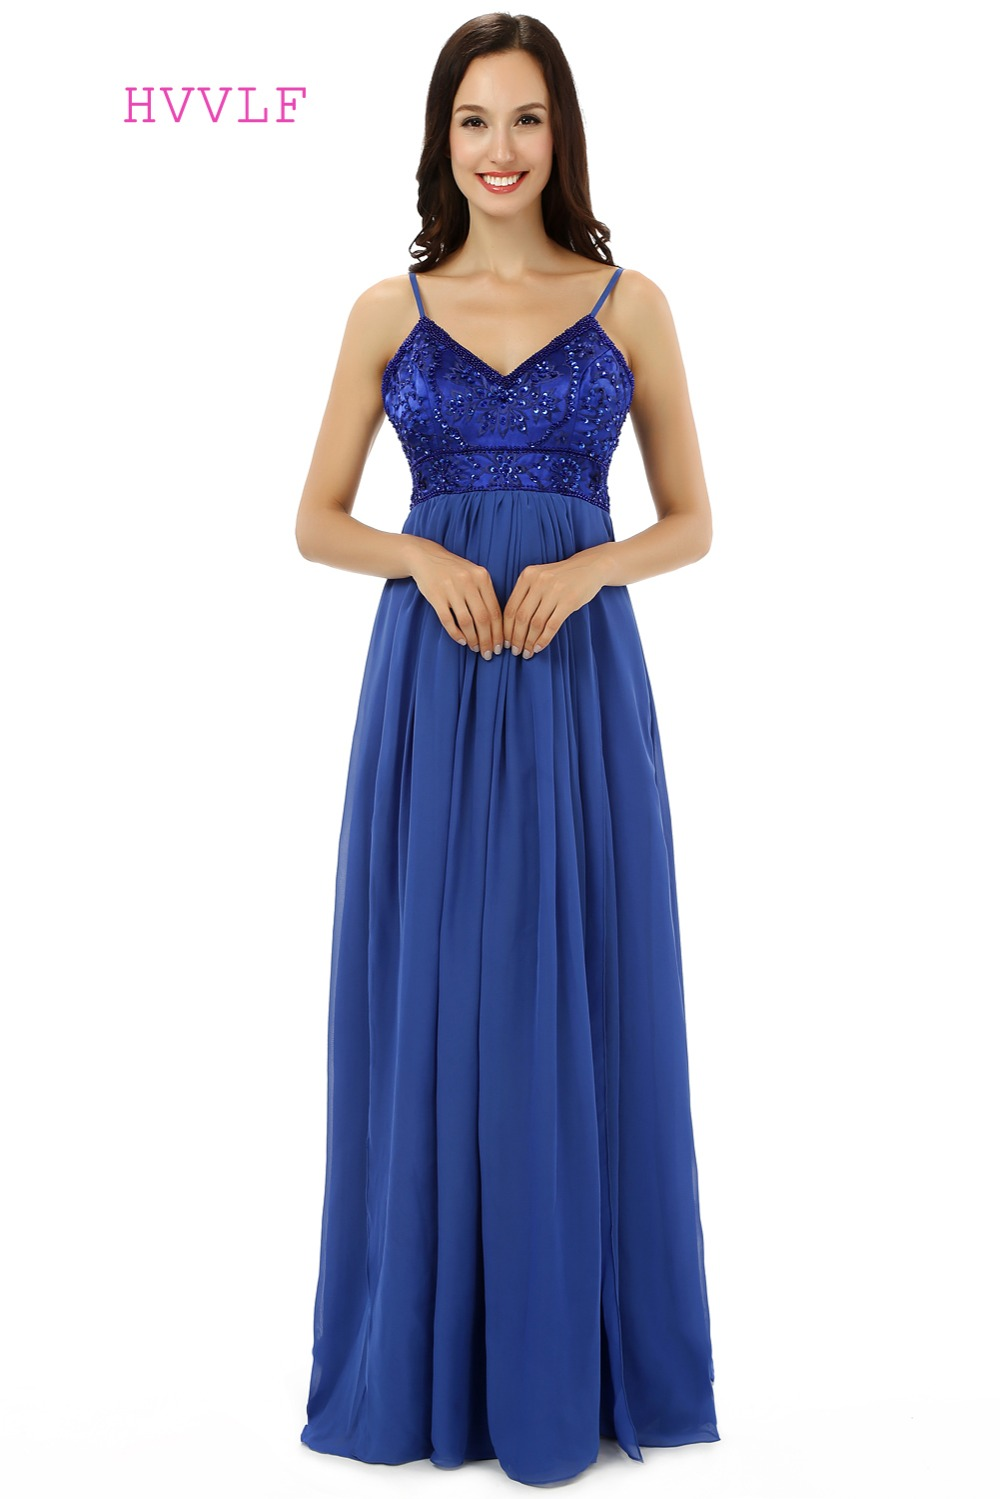 Maternity prom dress prom dress for pregant women - Royal Blue Evening Dresses 2017 A Line Spaghetti Straps Chiffon Bead Embroidery Maternity Long Evening